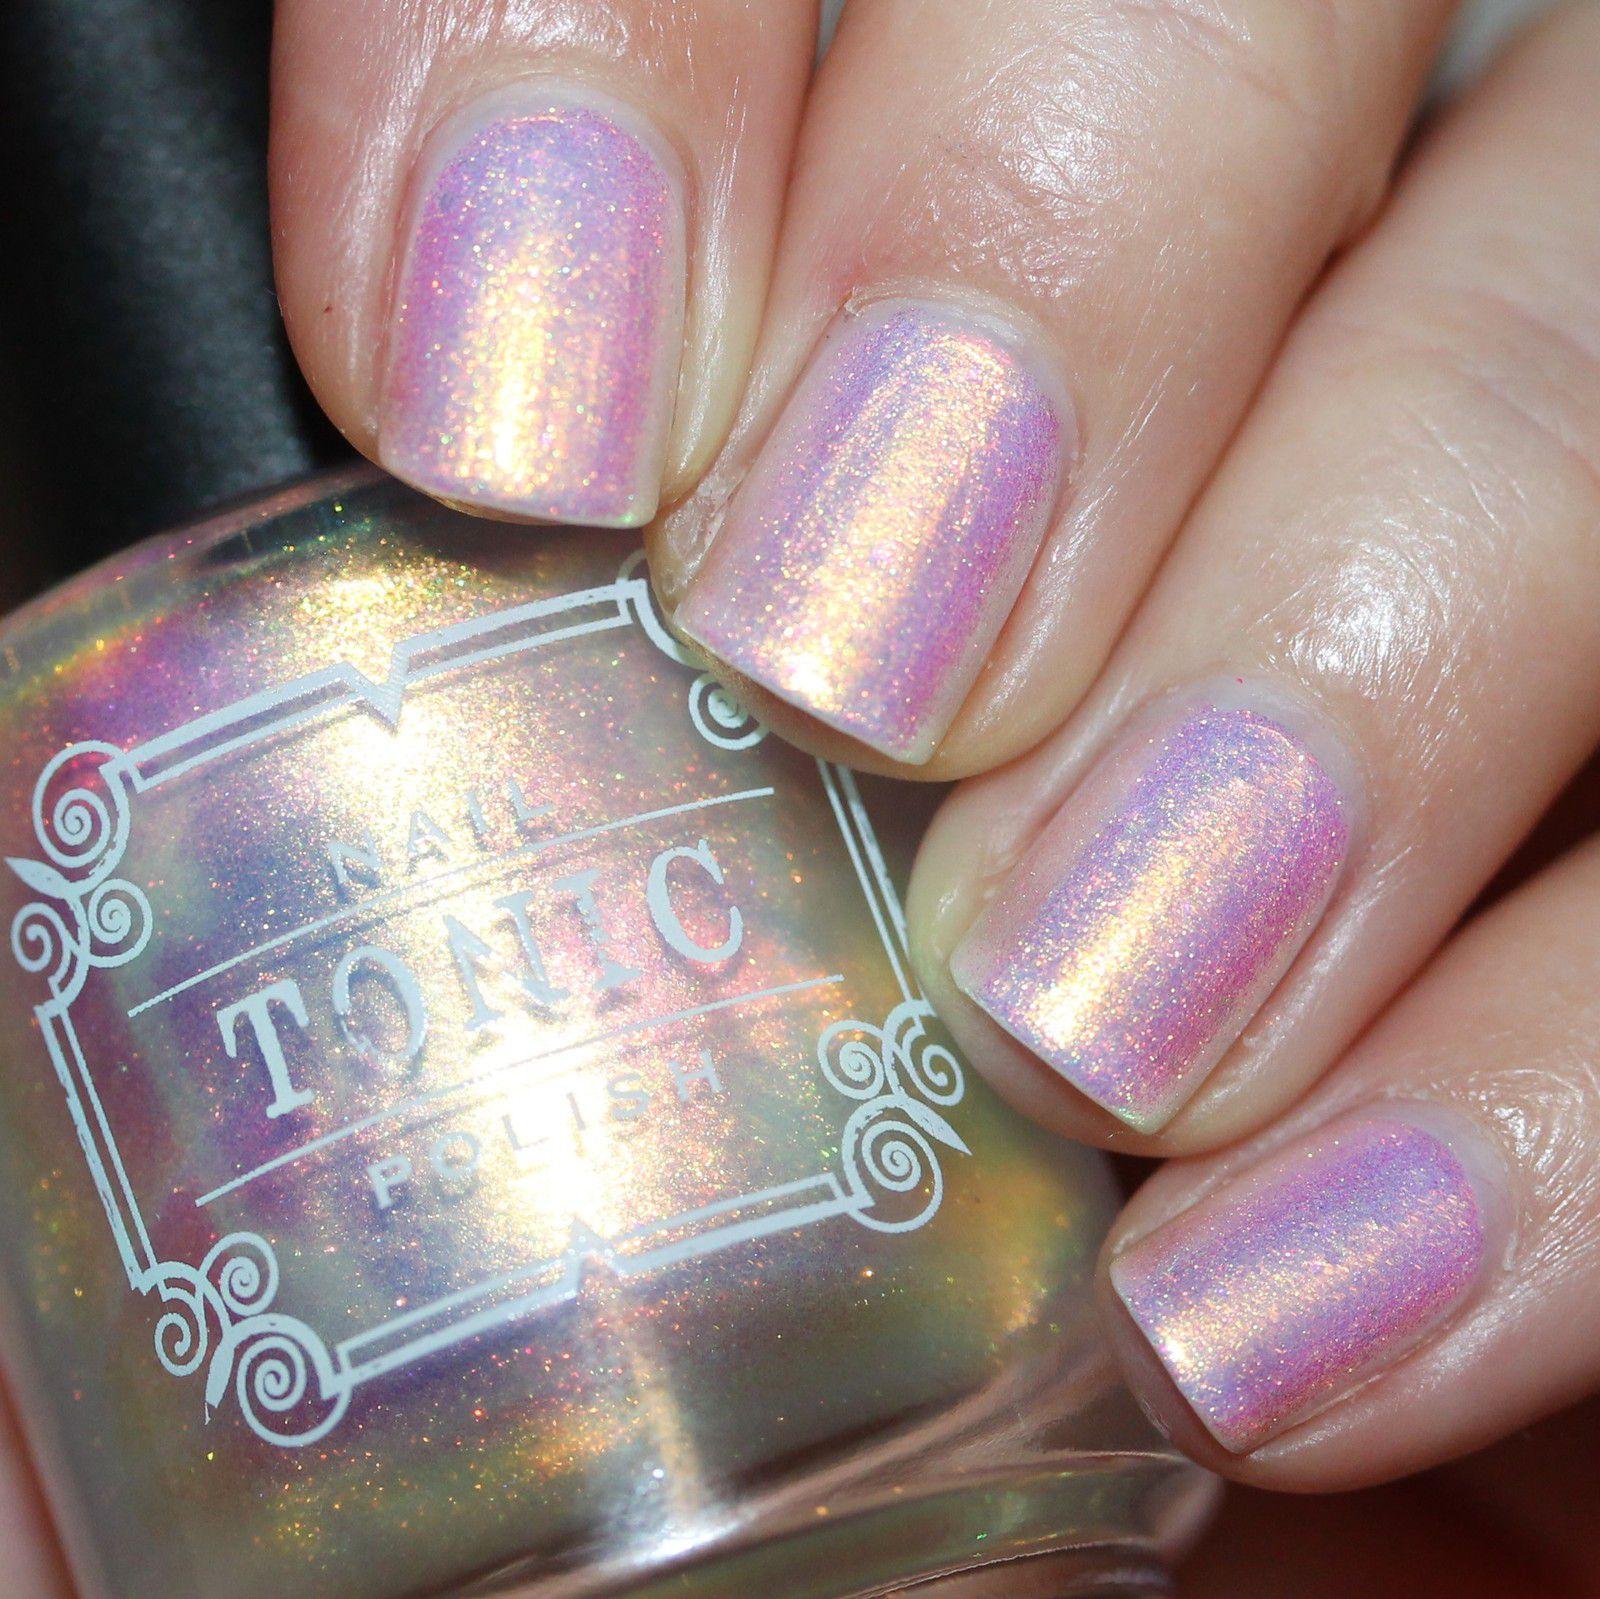 Essie Protein Base Coat / Tonic Polish Unicorn / Tonic Polish My Little Rainbow / Sally Hansen Miracle Gel Top Coat